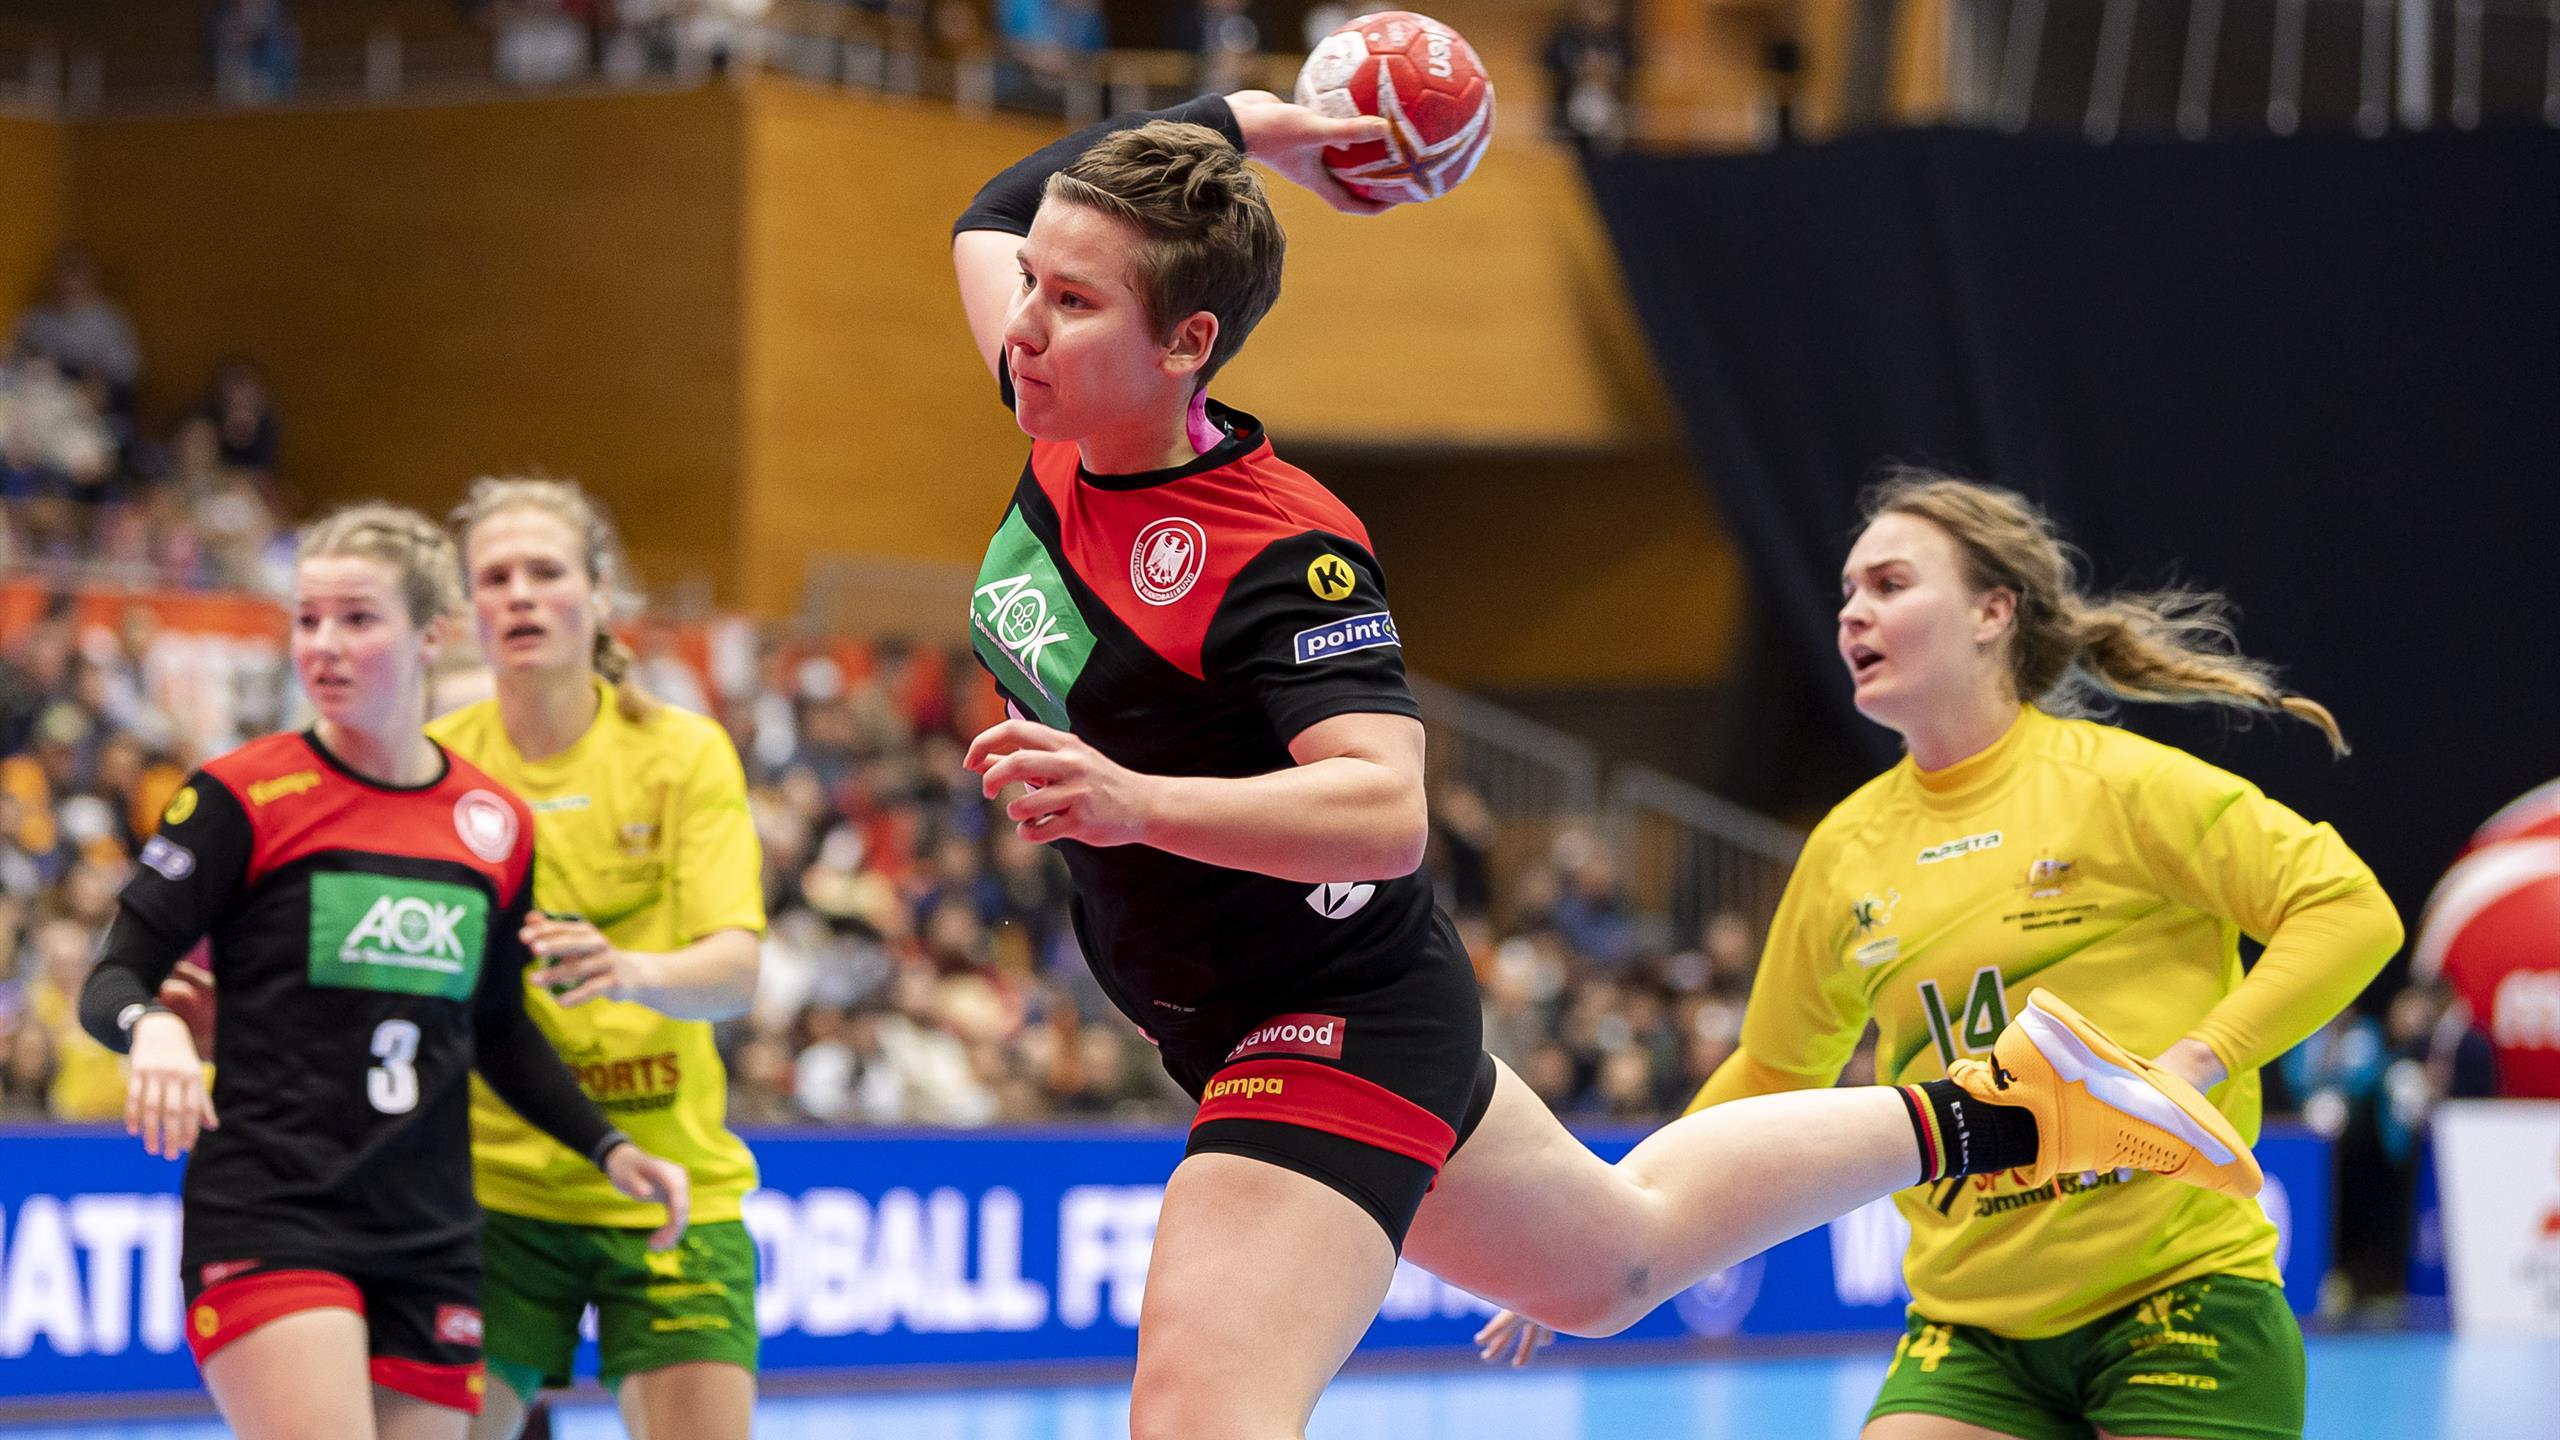 Tabelle Handball Wm 2021